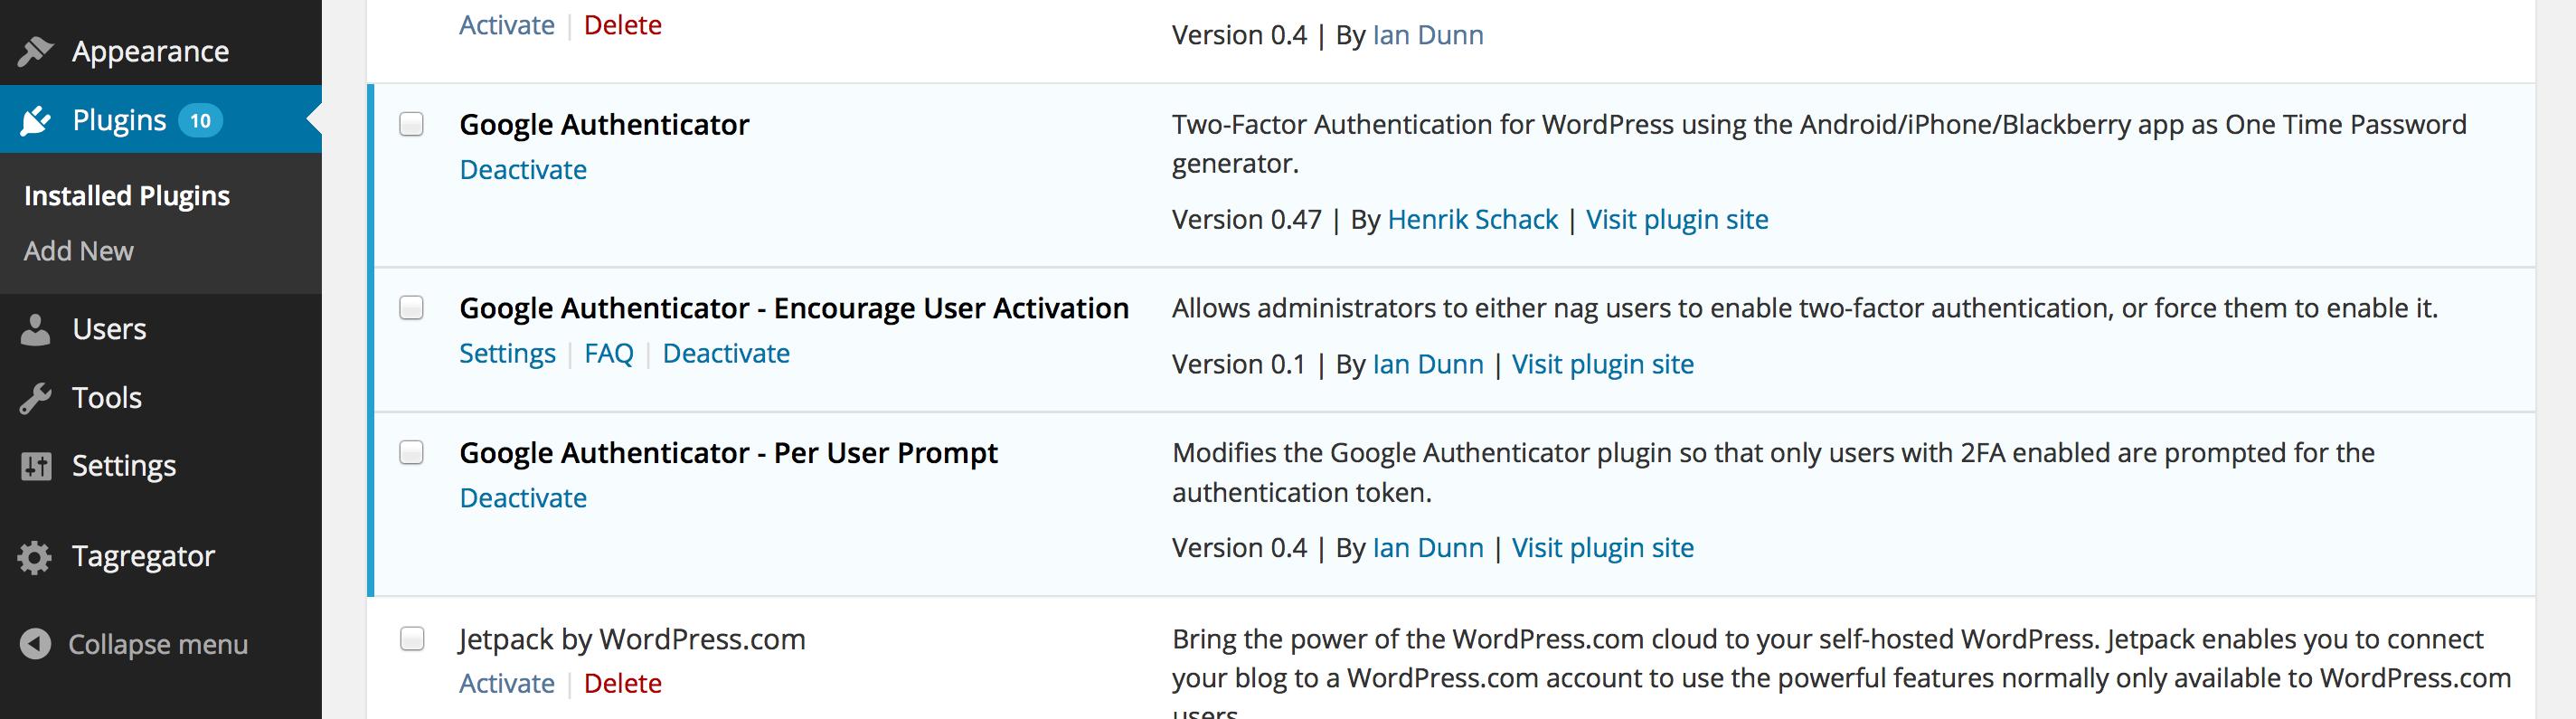 Best Practices for Customizing WordPress Plugins